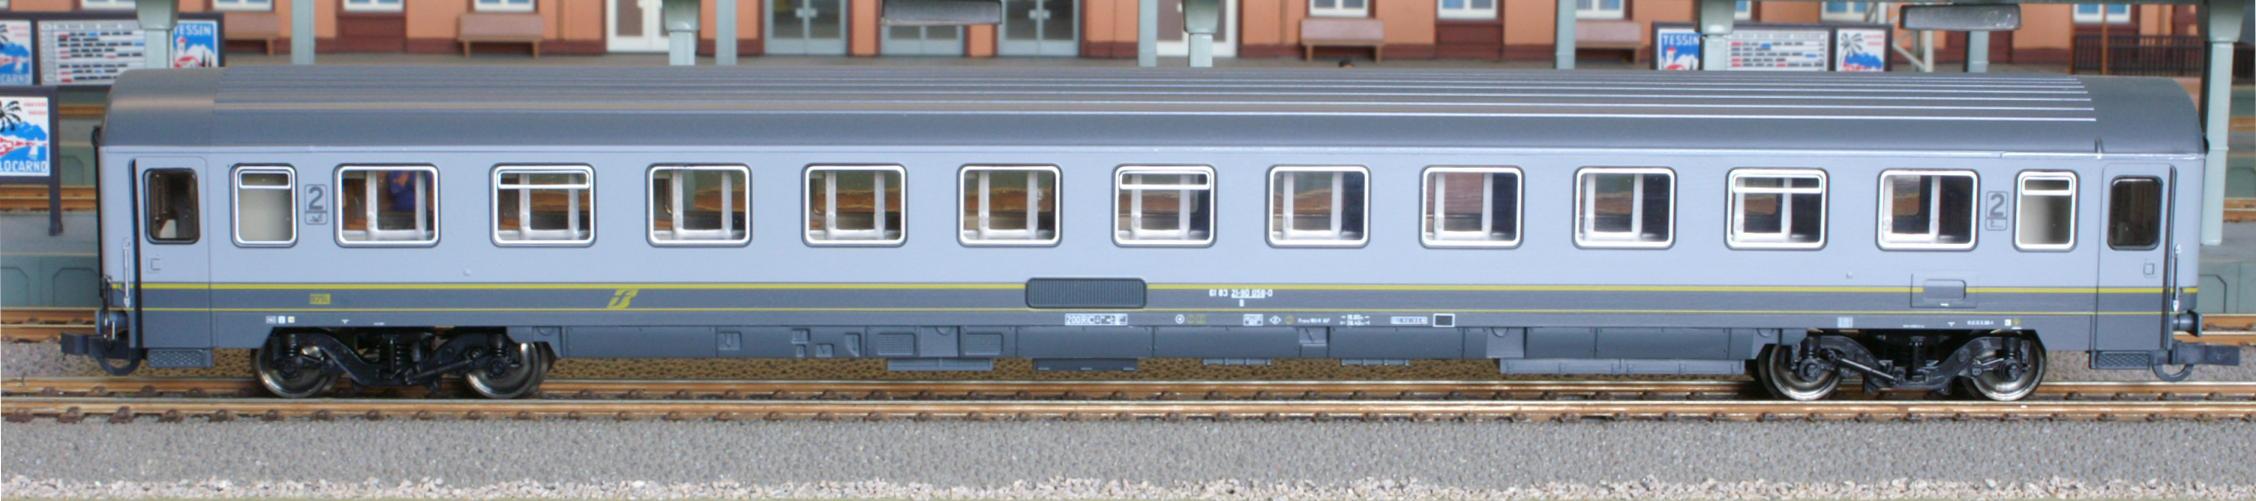 Roco 45221 - FS EURFIMA B-Wagen in alter Farbgebung, hellgraudunkelgrau, altes FS-LOGO.1